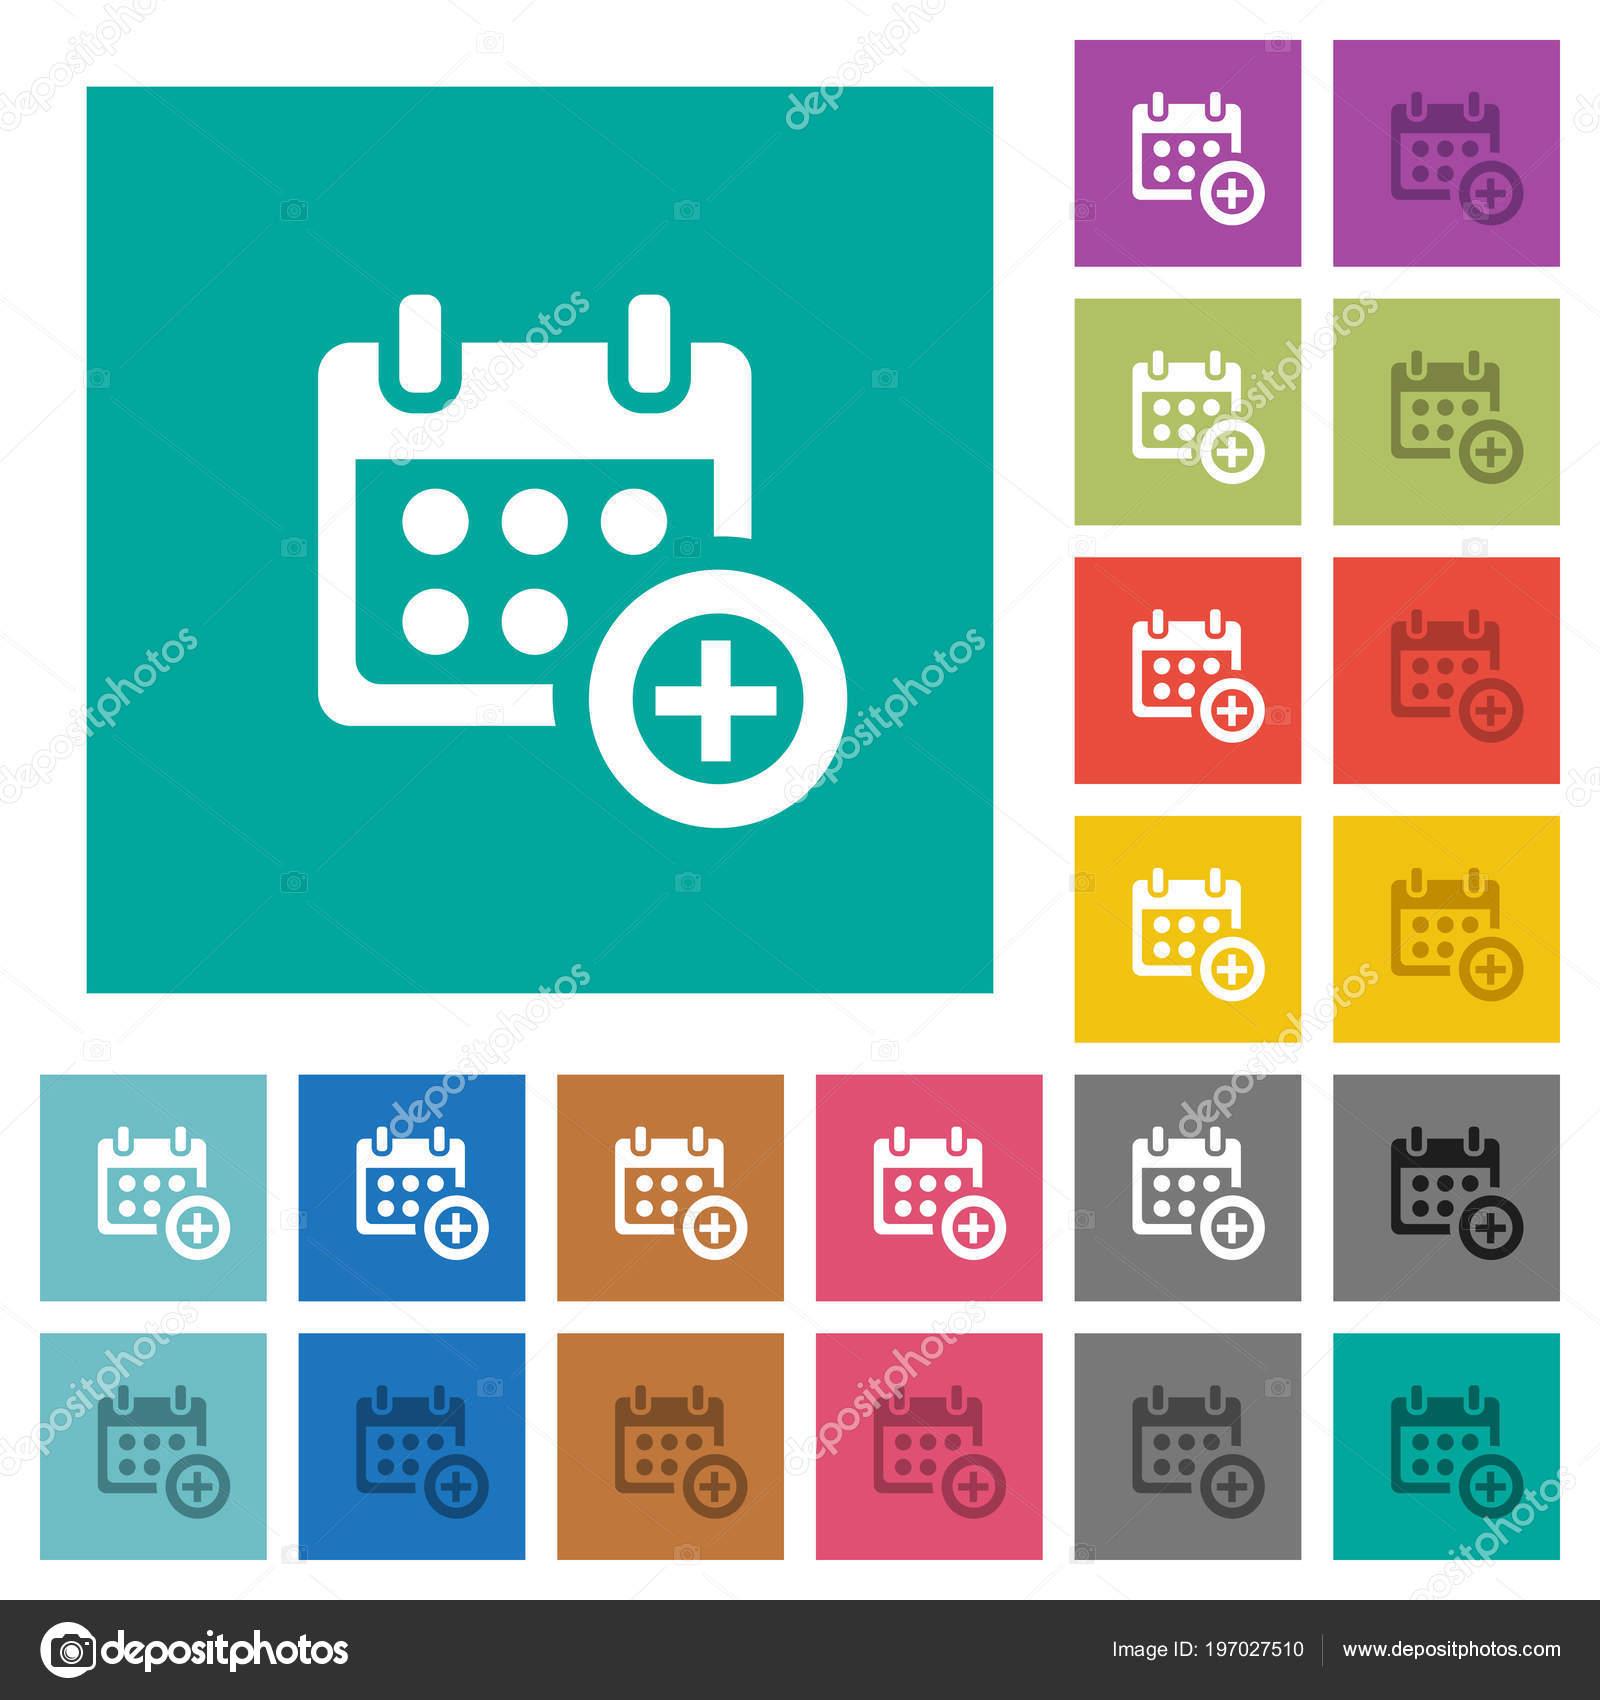 Anadir Calendario.Anadir Calendario Multi Coloreada Planos Iconos Fondos